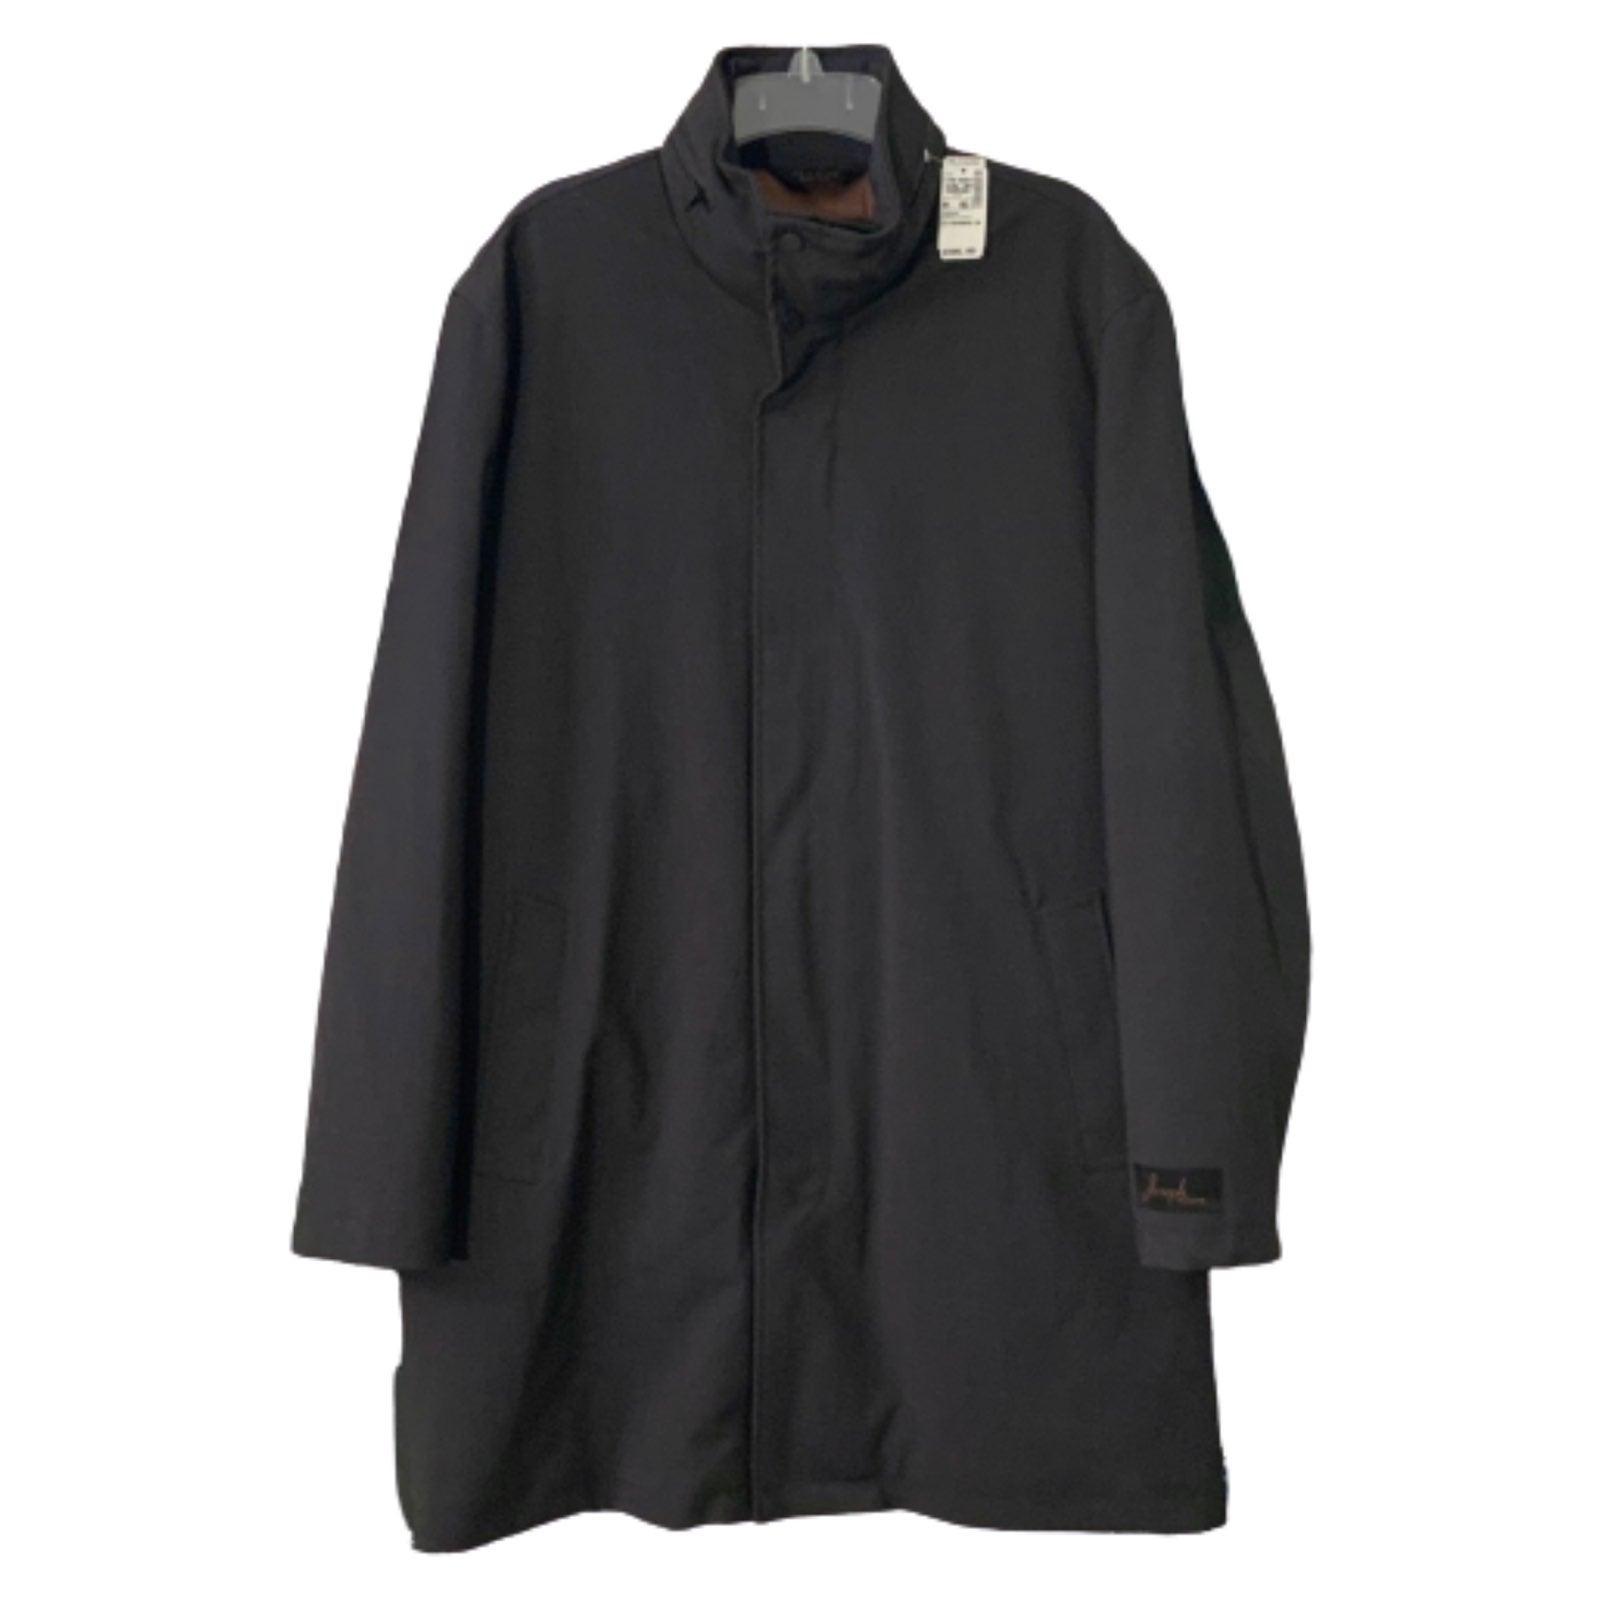 NWT Jos. A. Bank Traditional Raincoat XL